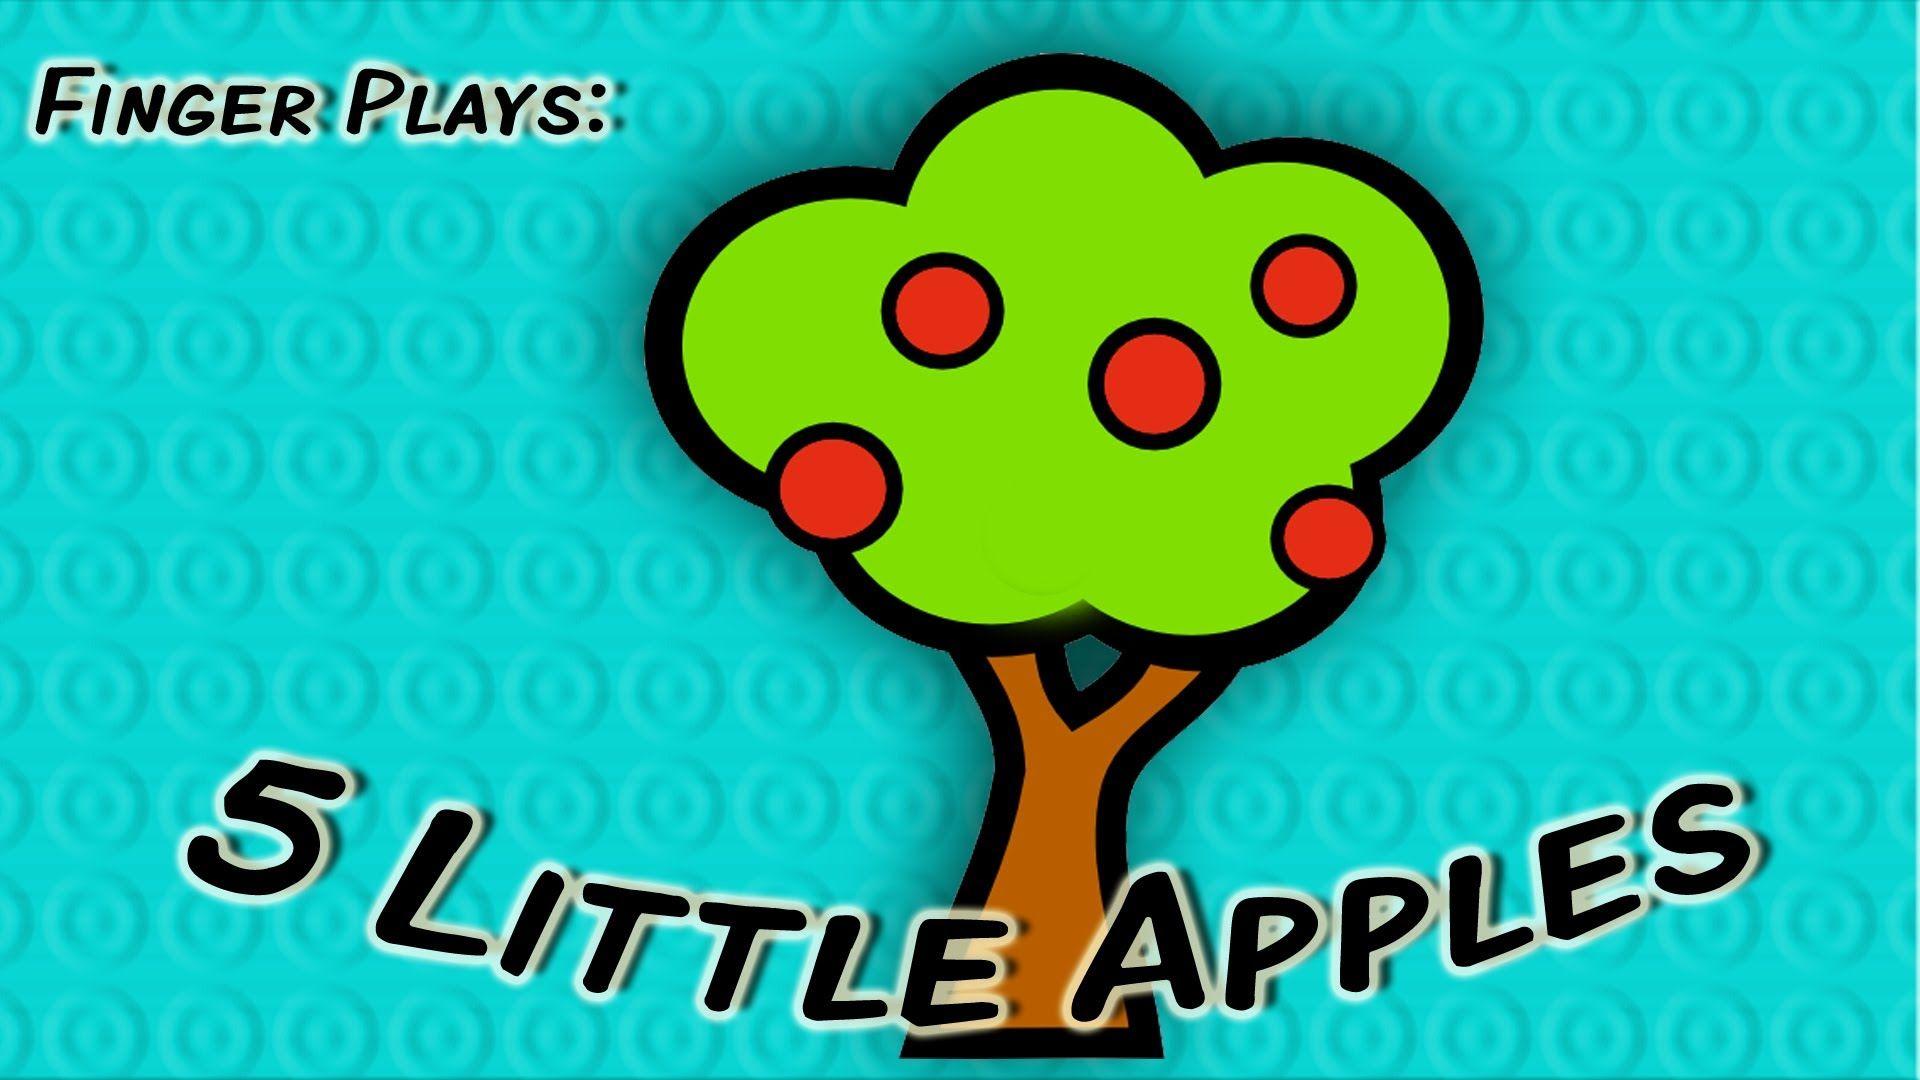 5 Little Apples | finger play song for children | Apples and ...